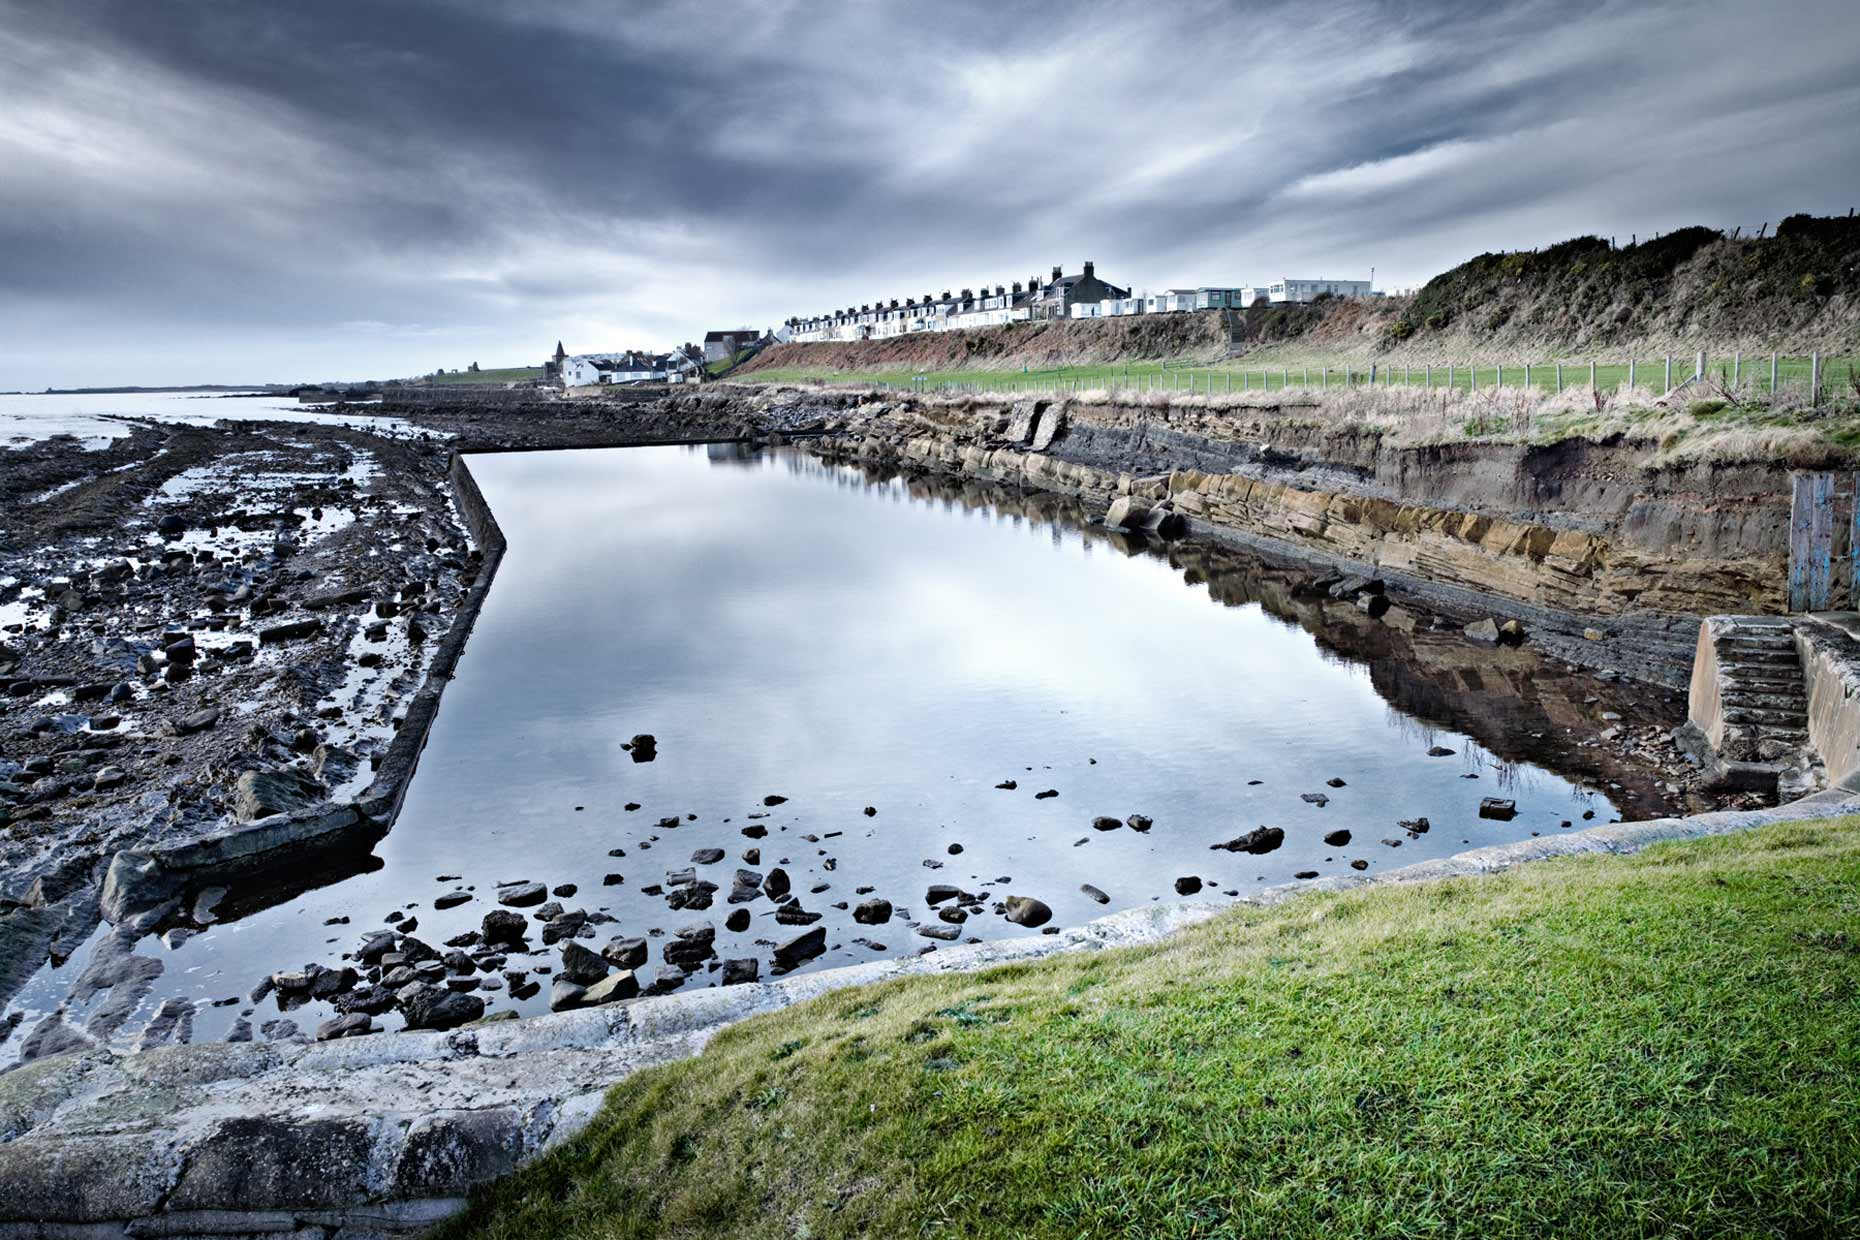 tidal-pools-scotland-pim-vuik-fotografie-film-rotterdam-04.jpg